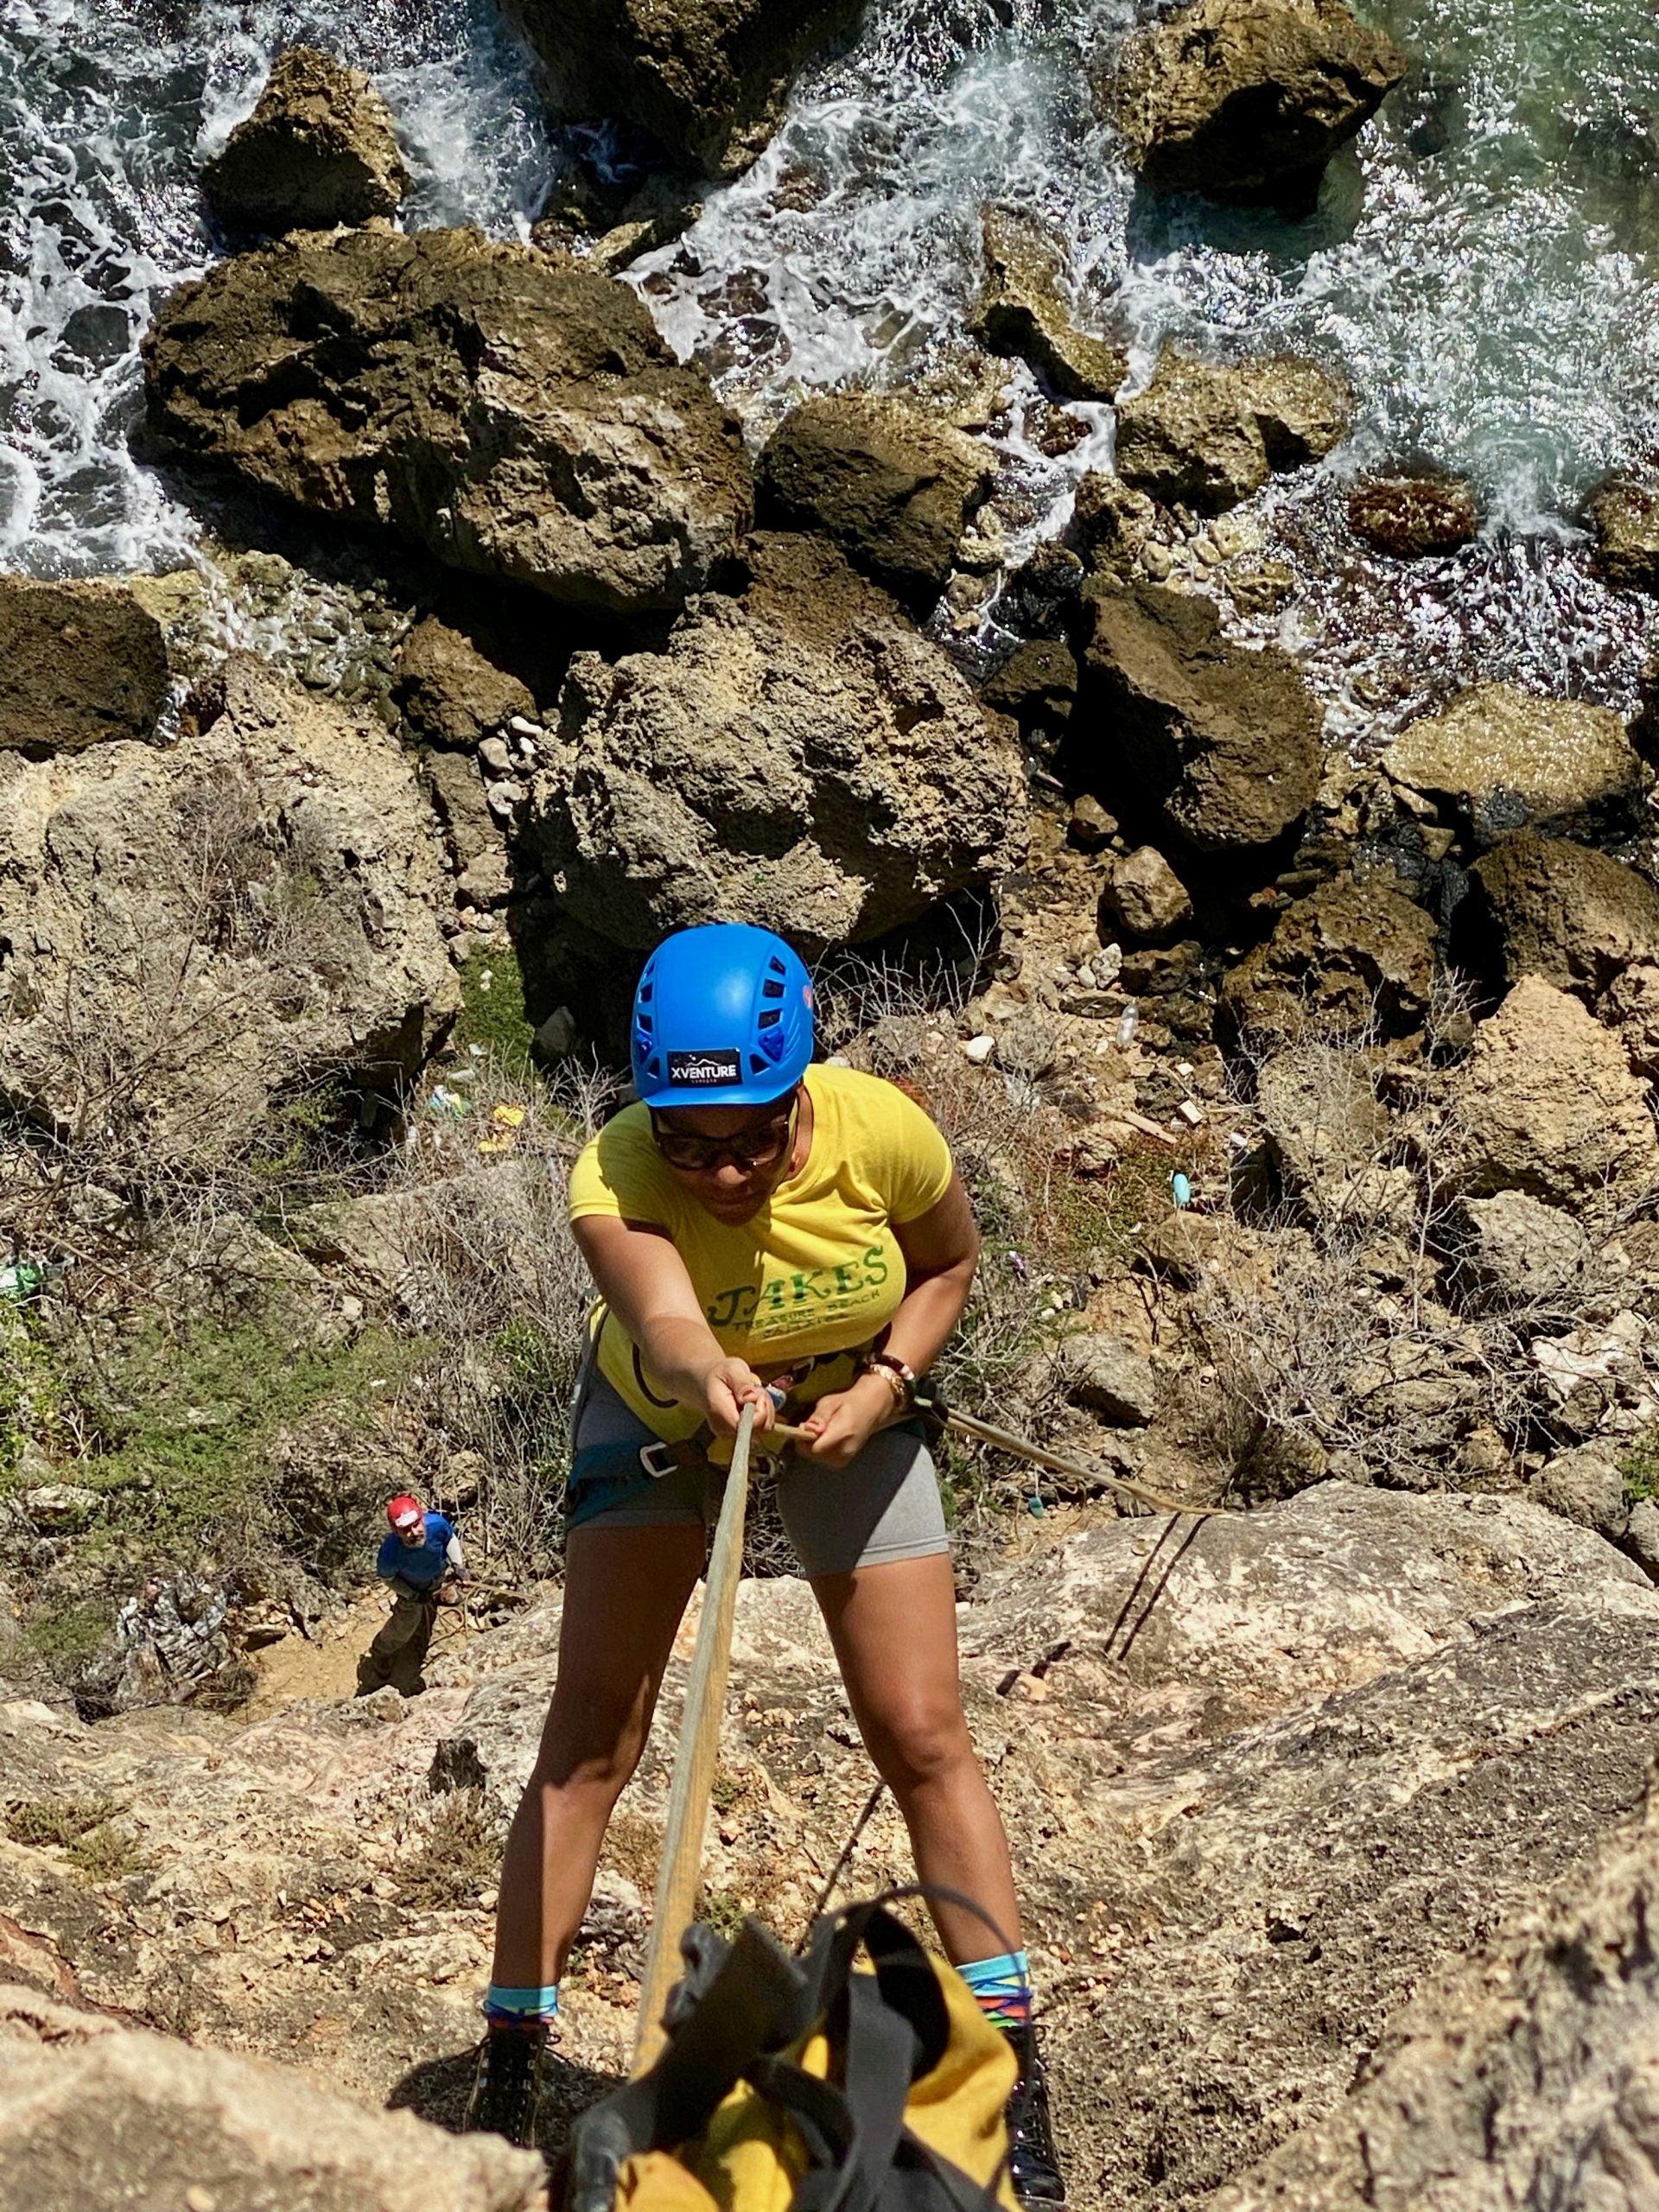 Travel expert rock climbs in Curacao